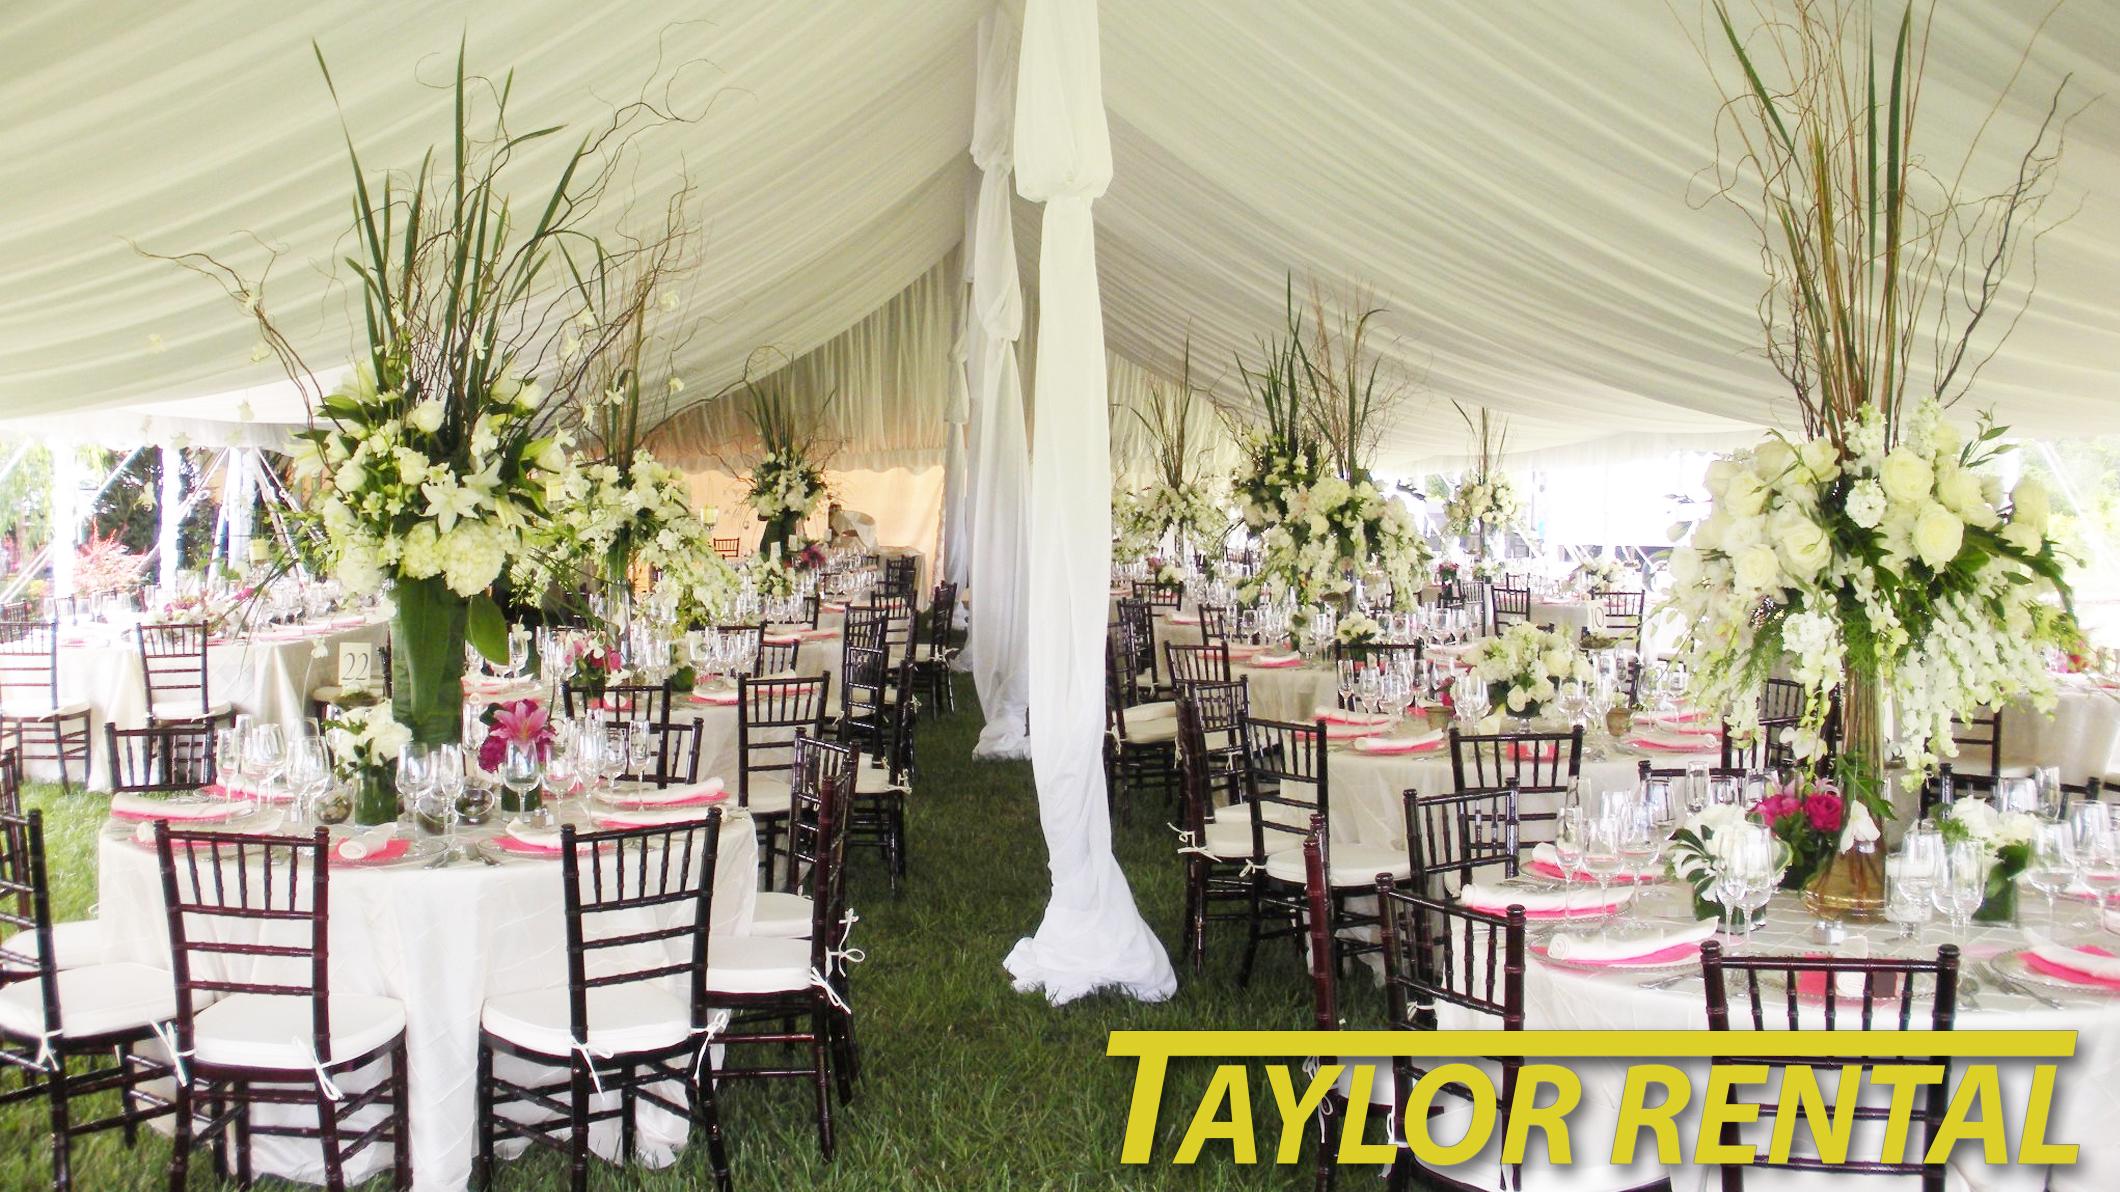 Taylor Rental Center Petoskey image 0